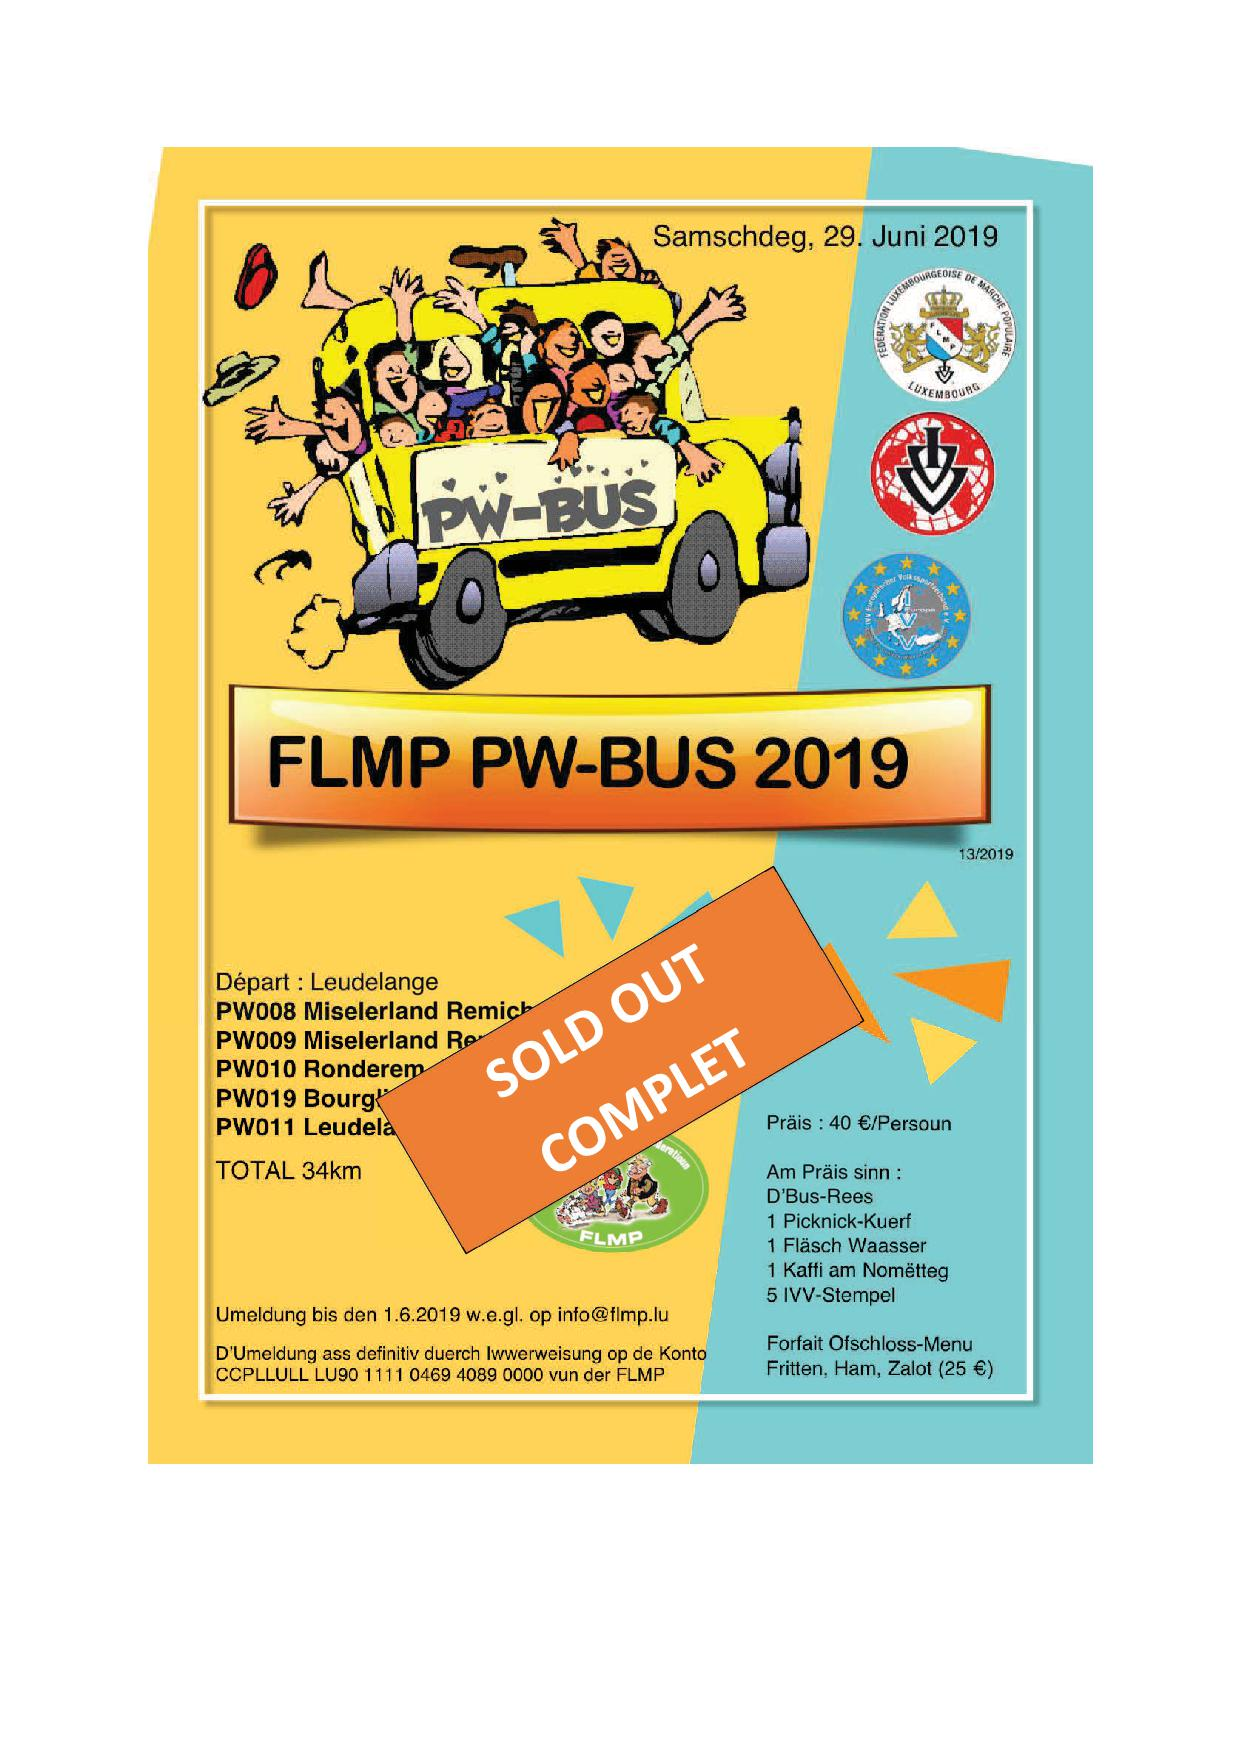 FLMP PW-BUS 2019